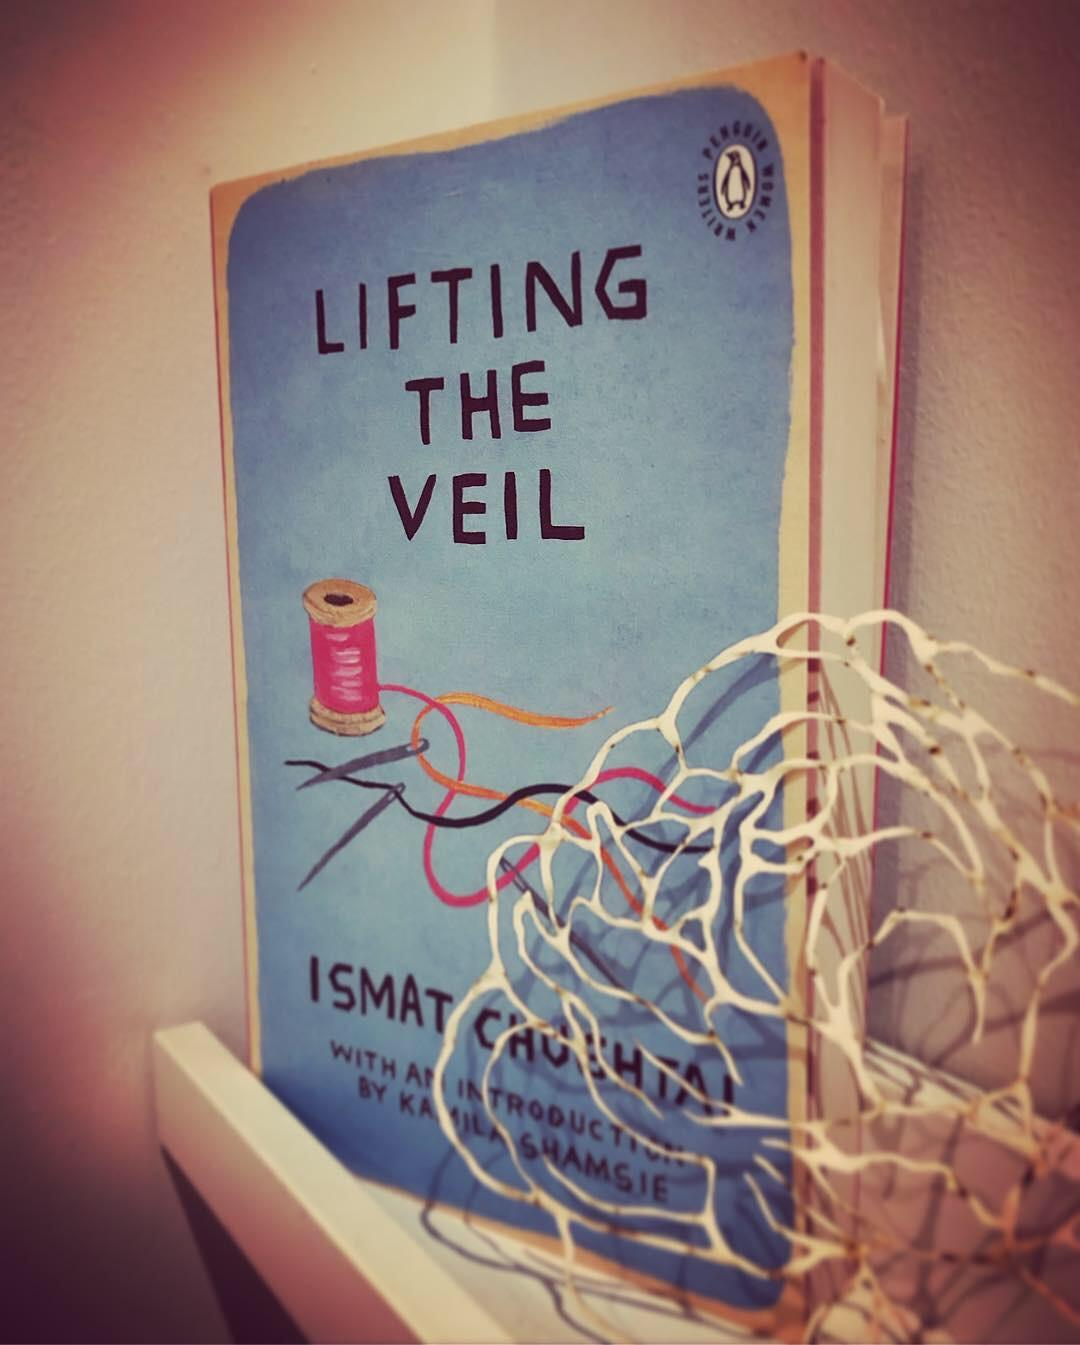 LIFTING THE VEIL: ISMAT CHUGHTAI